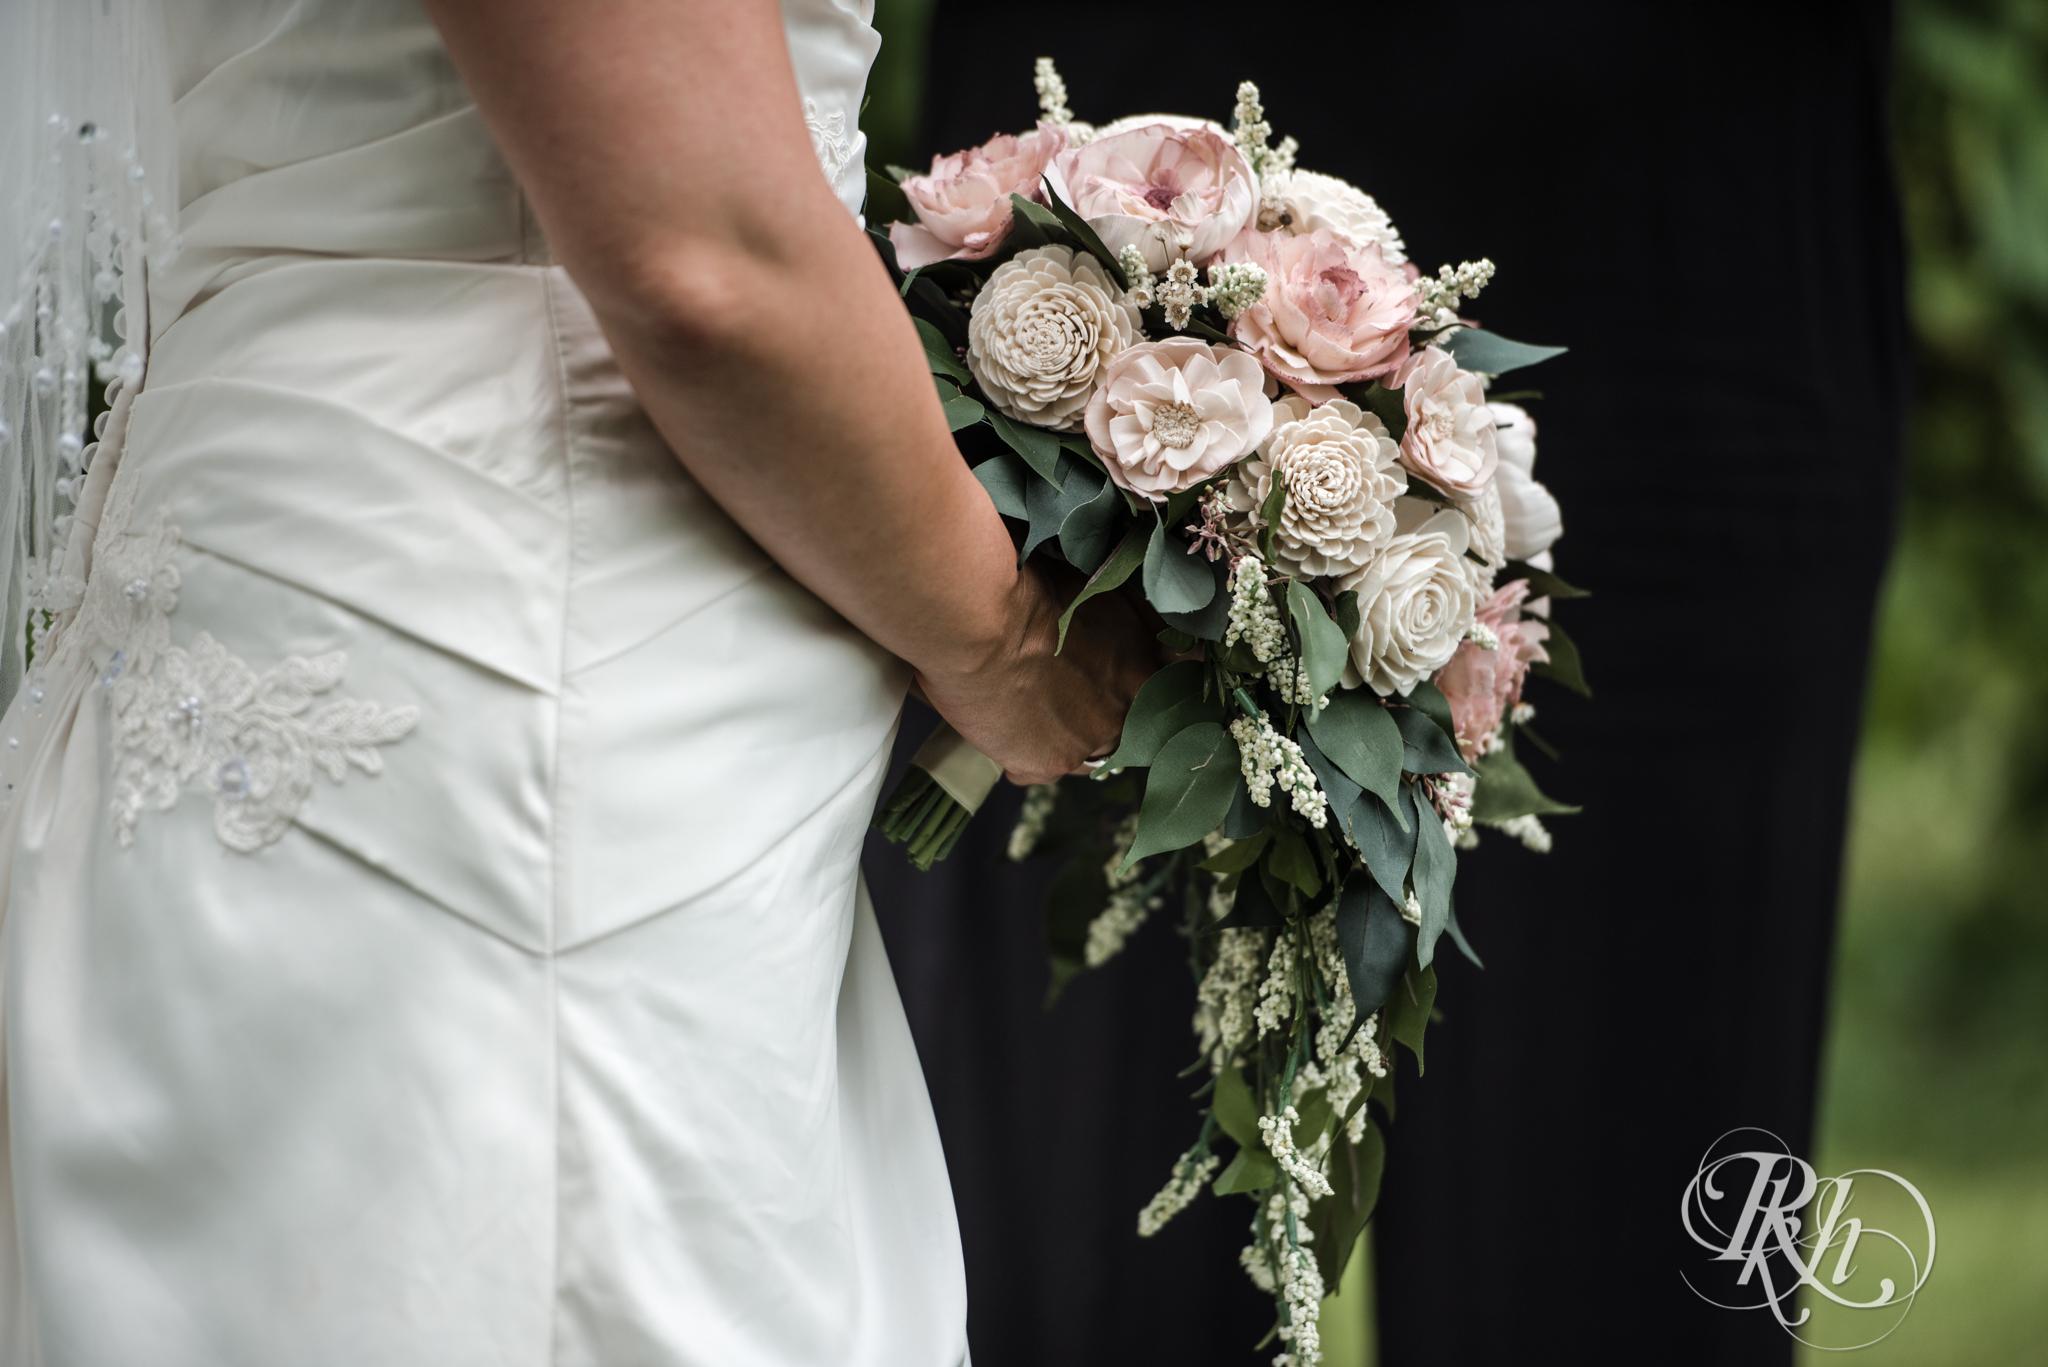 Ally & Nick - Minnesota Wedding Photography - Next Chapter Winery - RKH Images - Blog (21 of 57).jpg